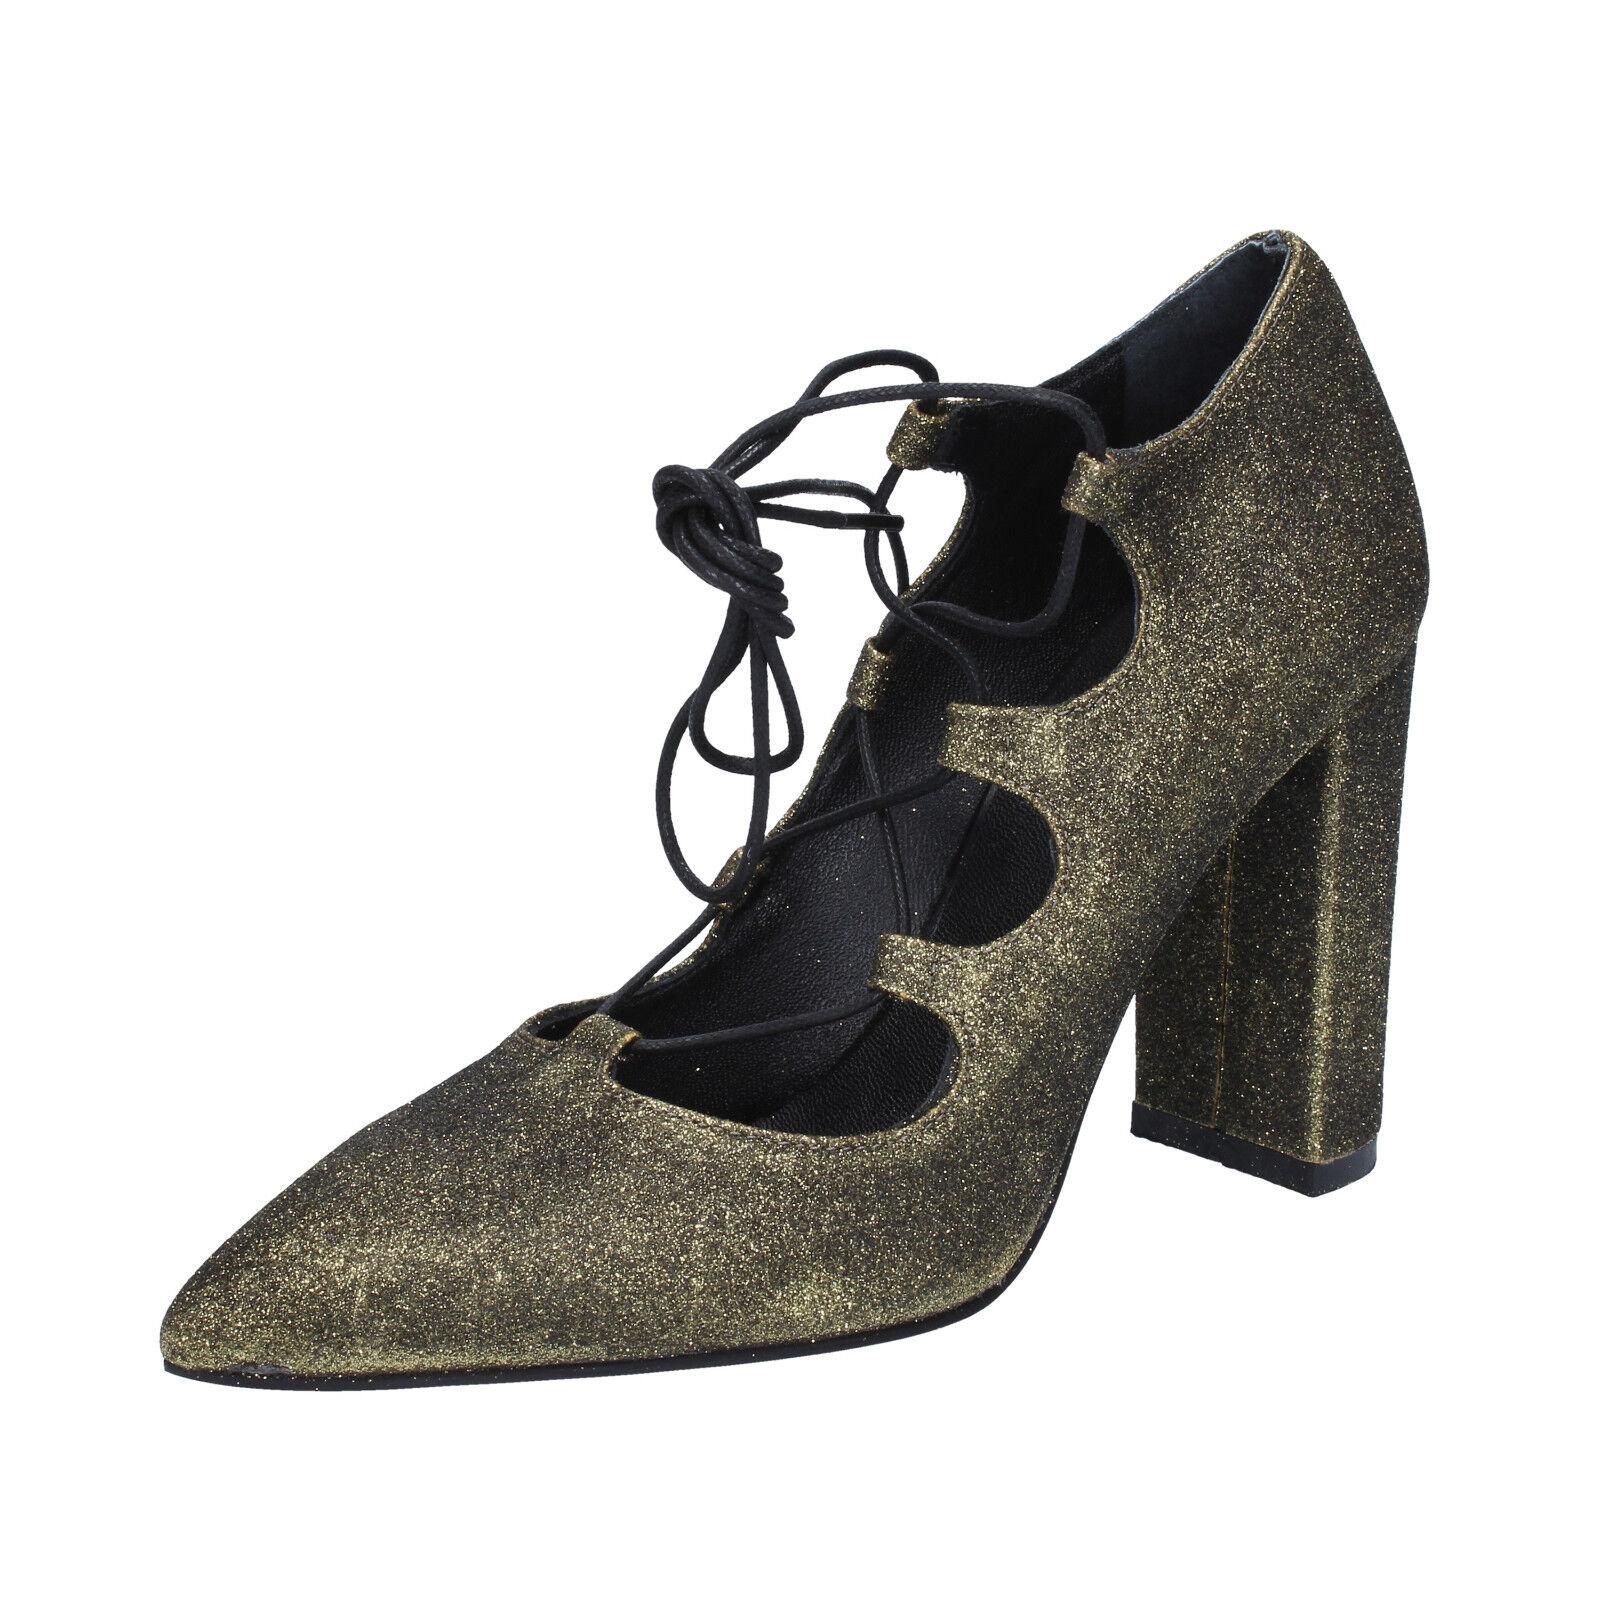 Zapatos fehombresinos ISO Isabella Lorusso 4 (EU 37) Courts oro Flash bz215 - C